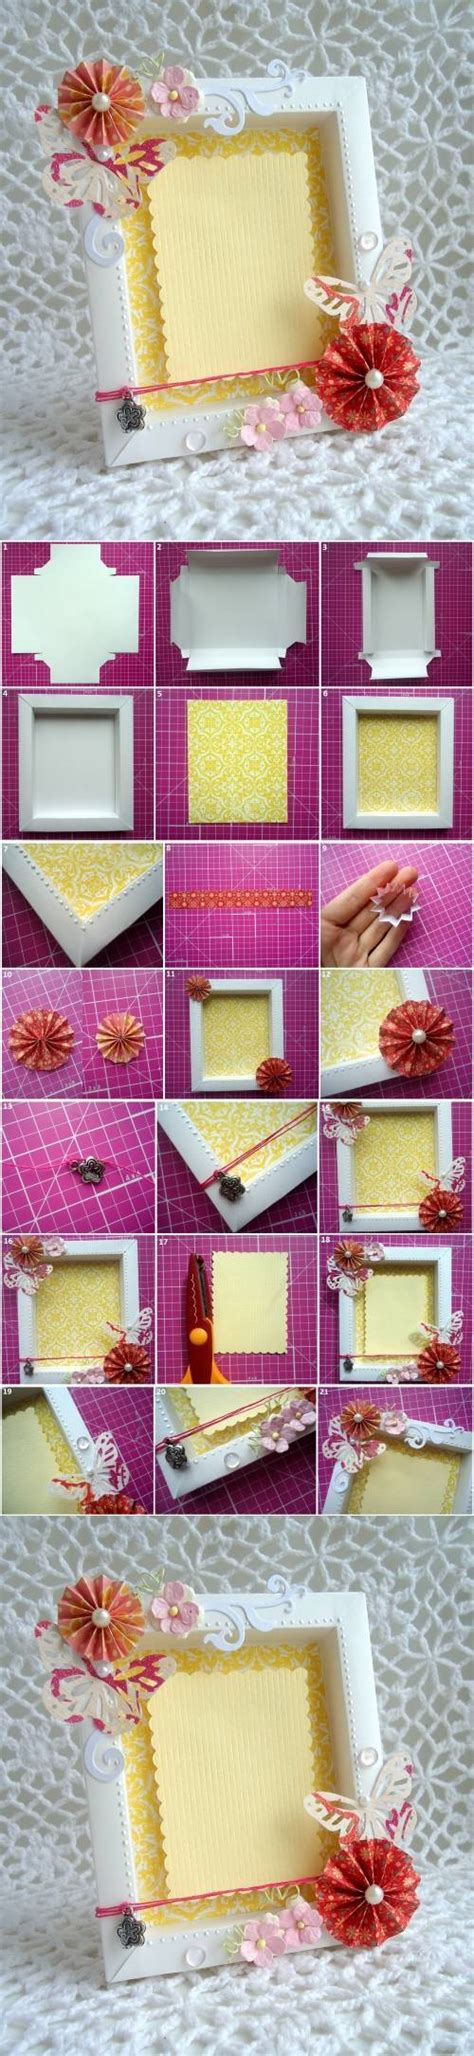 cool frame designs diy cute cardboard picture frame